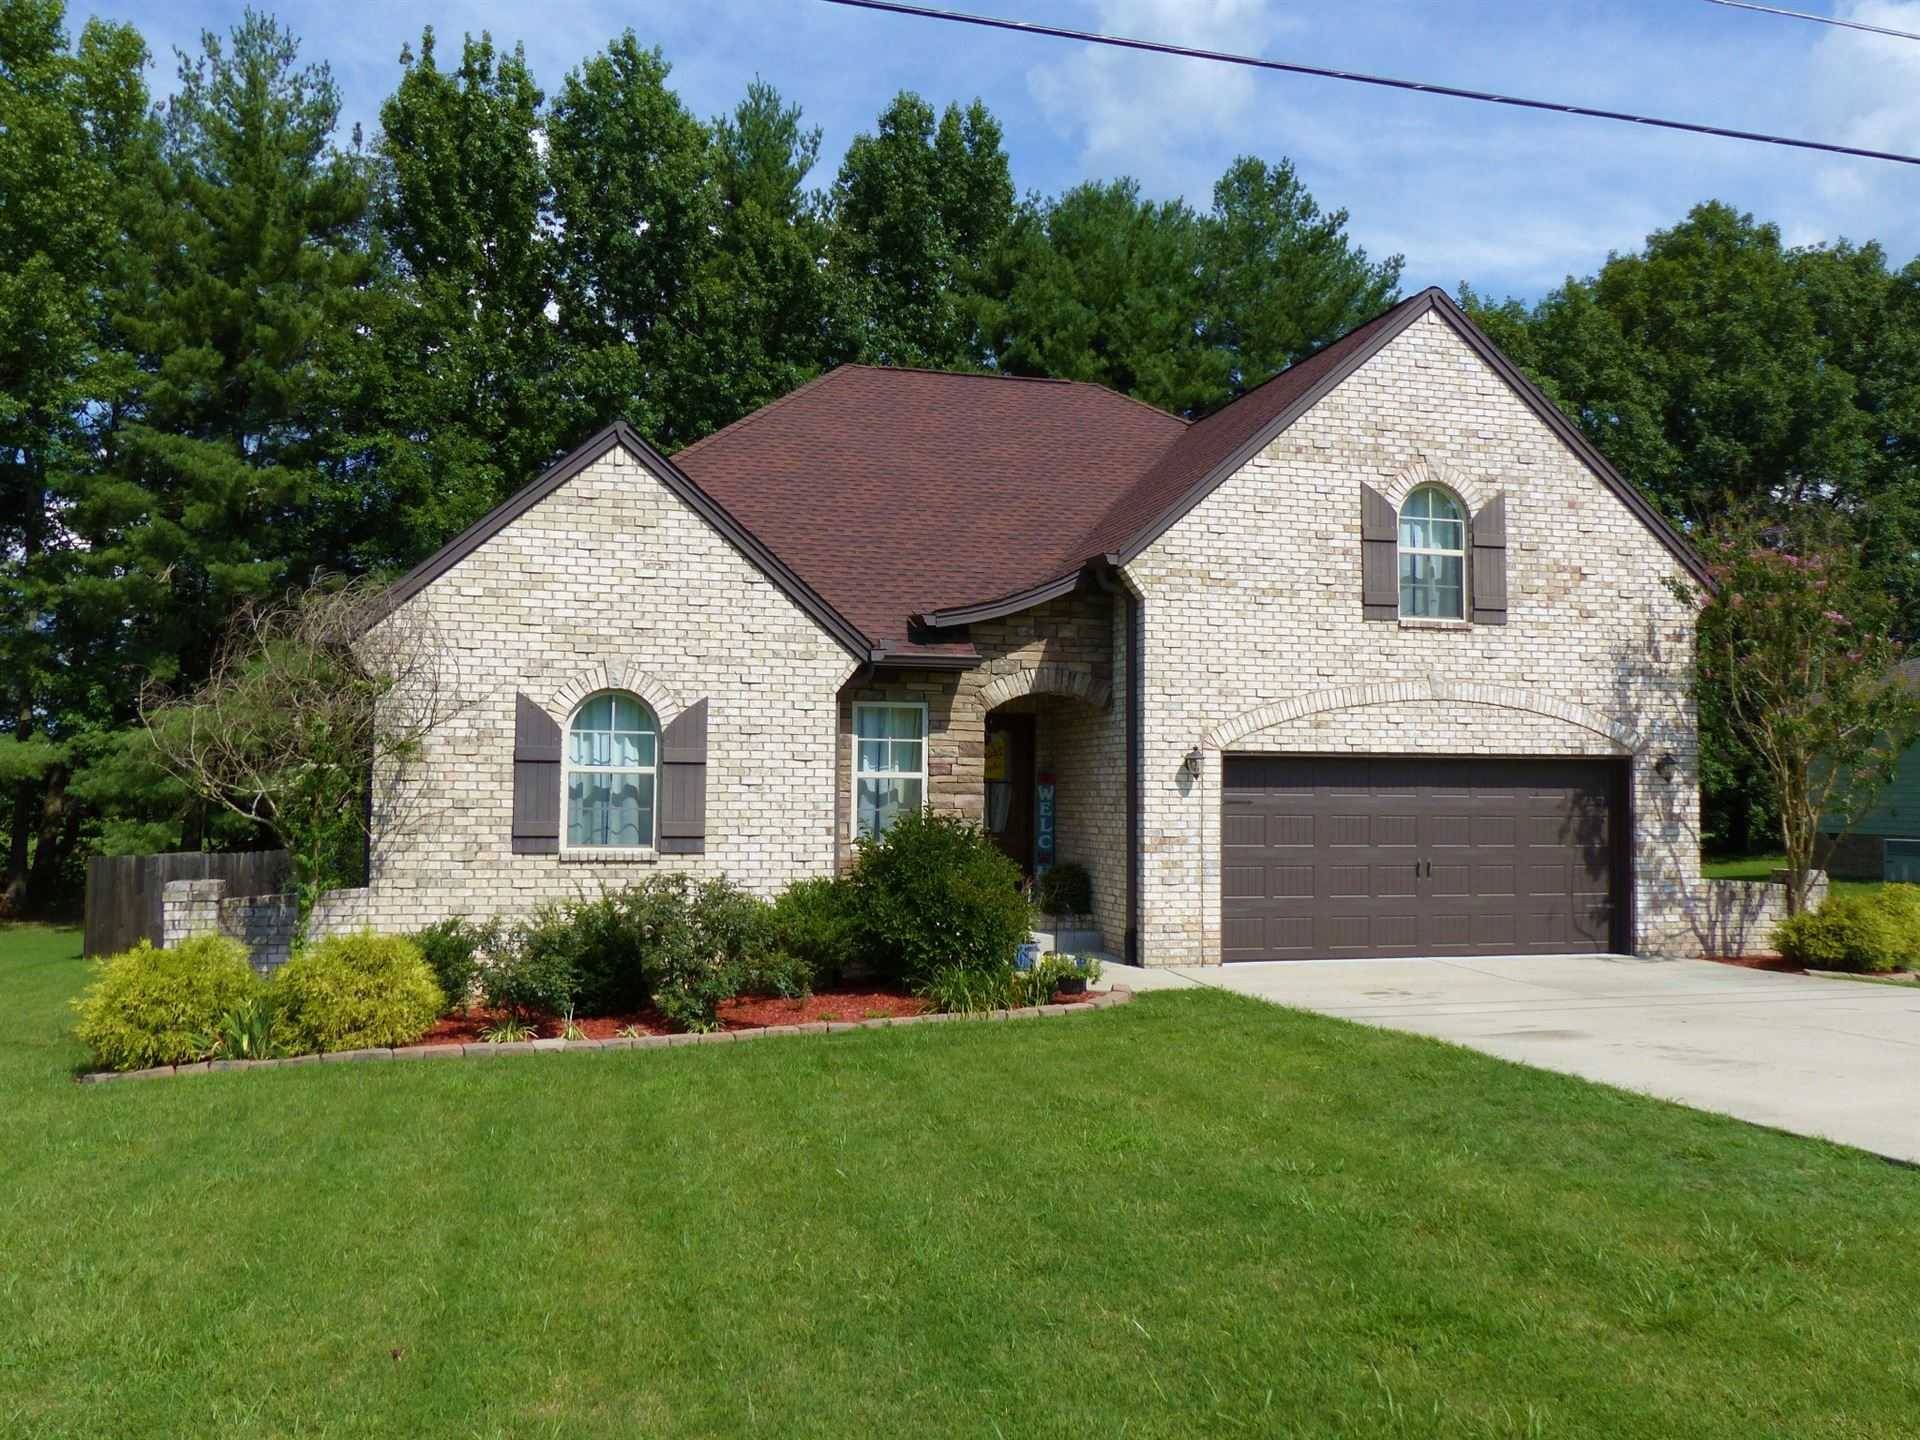 1024 Northridge Dr, Greenbrier, TN 37073 - MLS#: 2176551